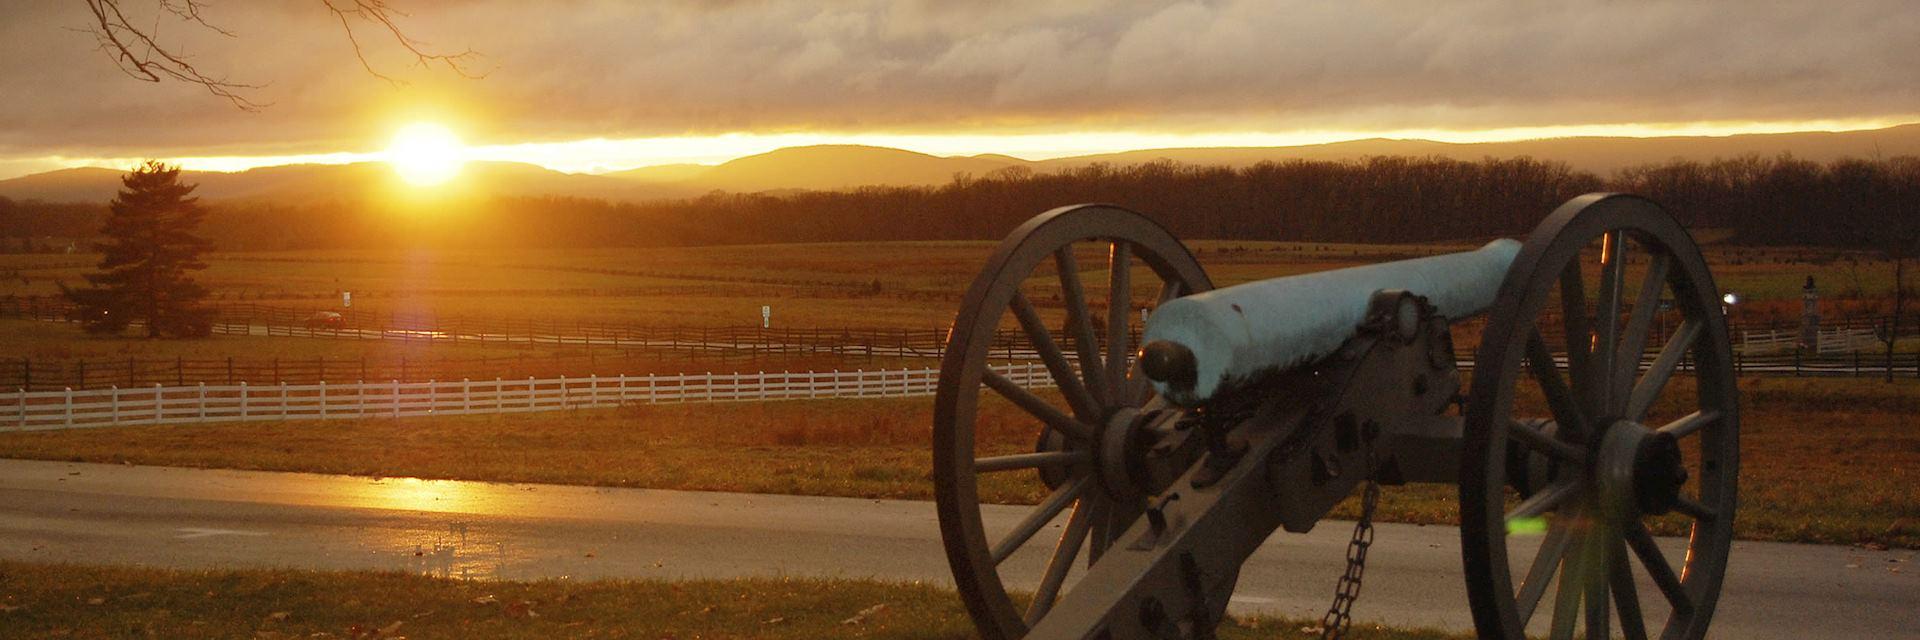 The battlefield of Gettysburg